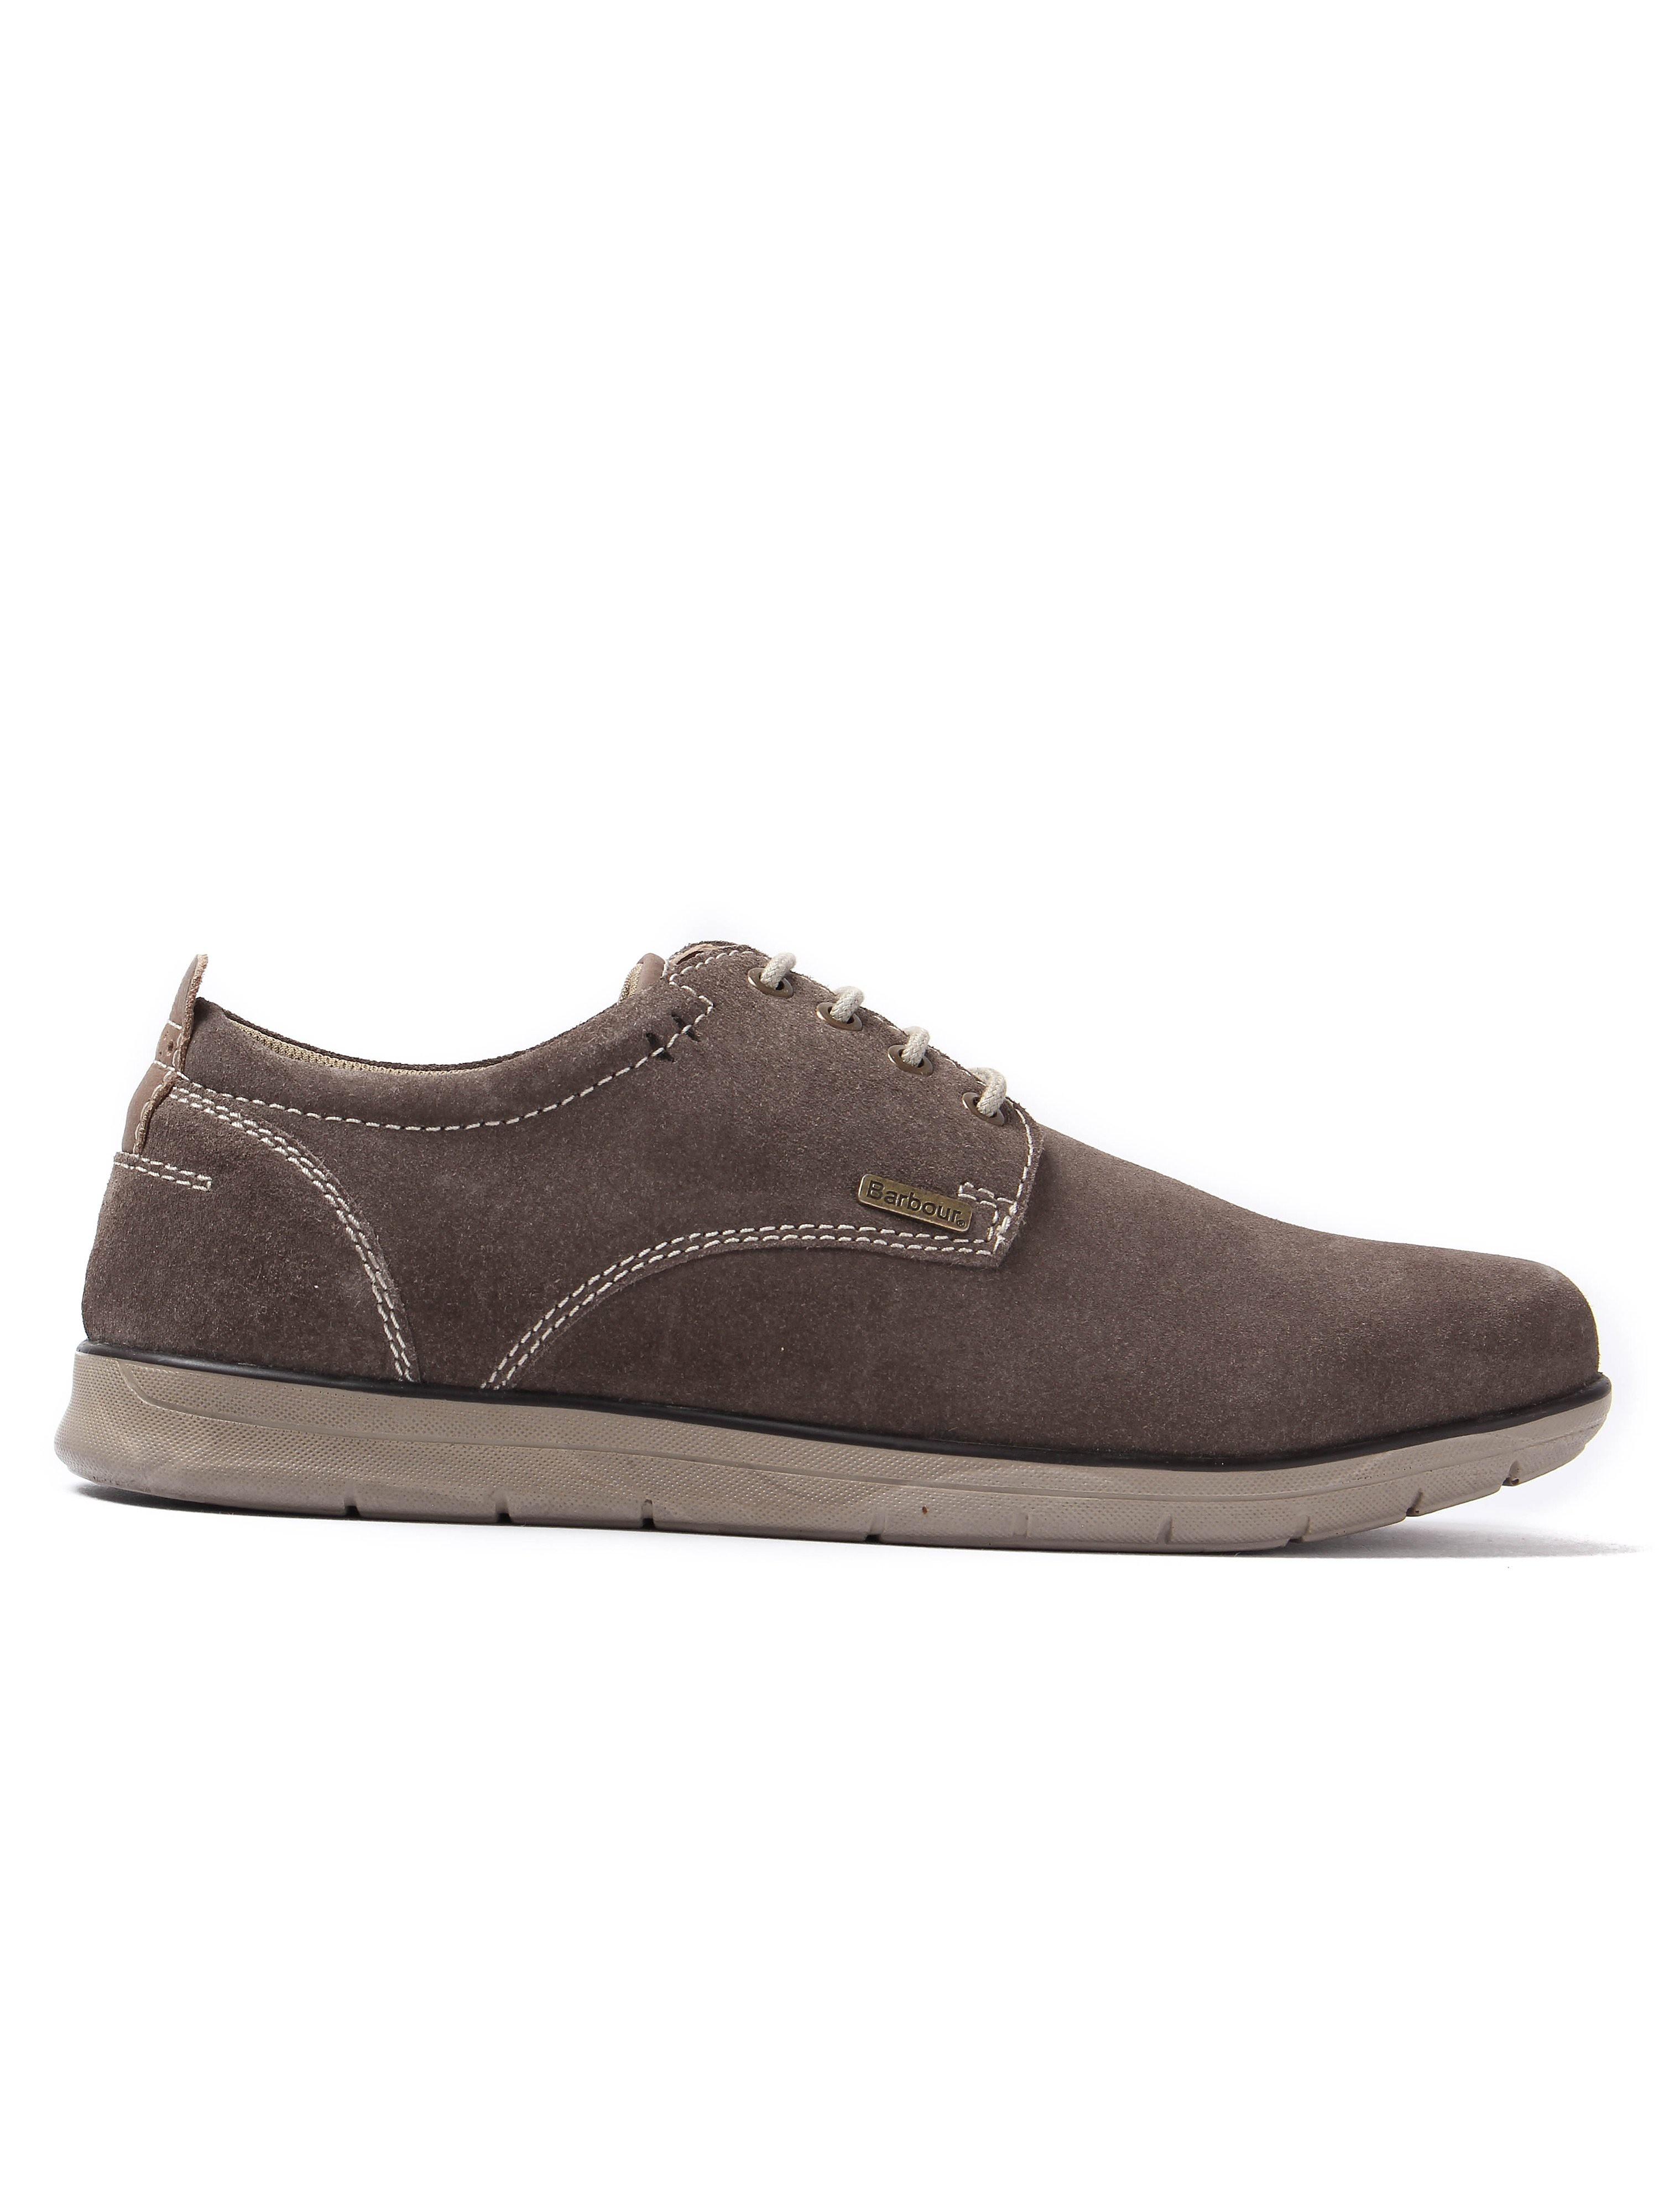 Barbour Men's Atkinson Chukka Shoes - Sand Nubuck